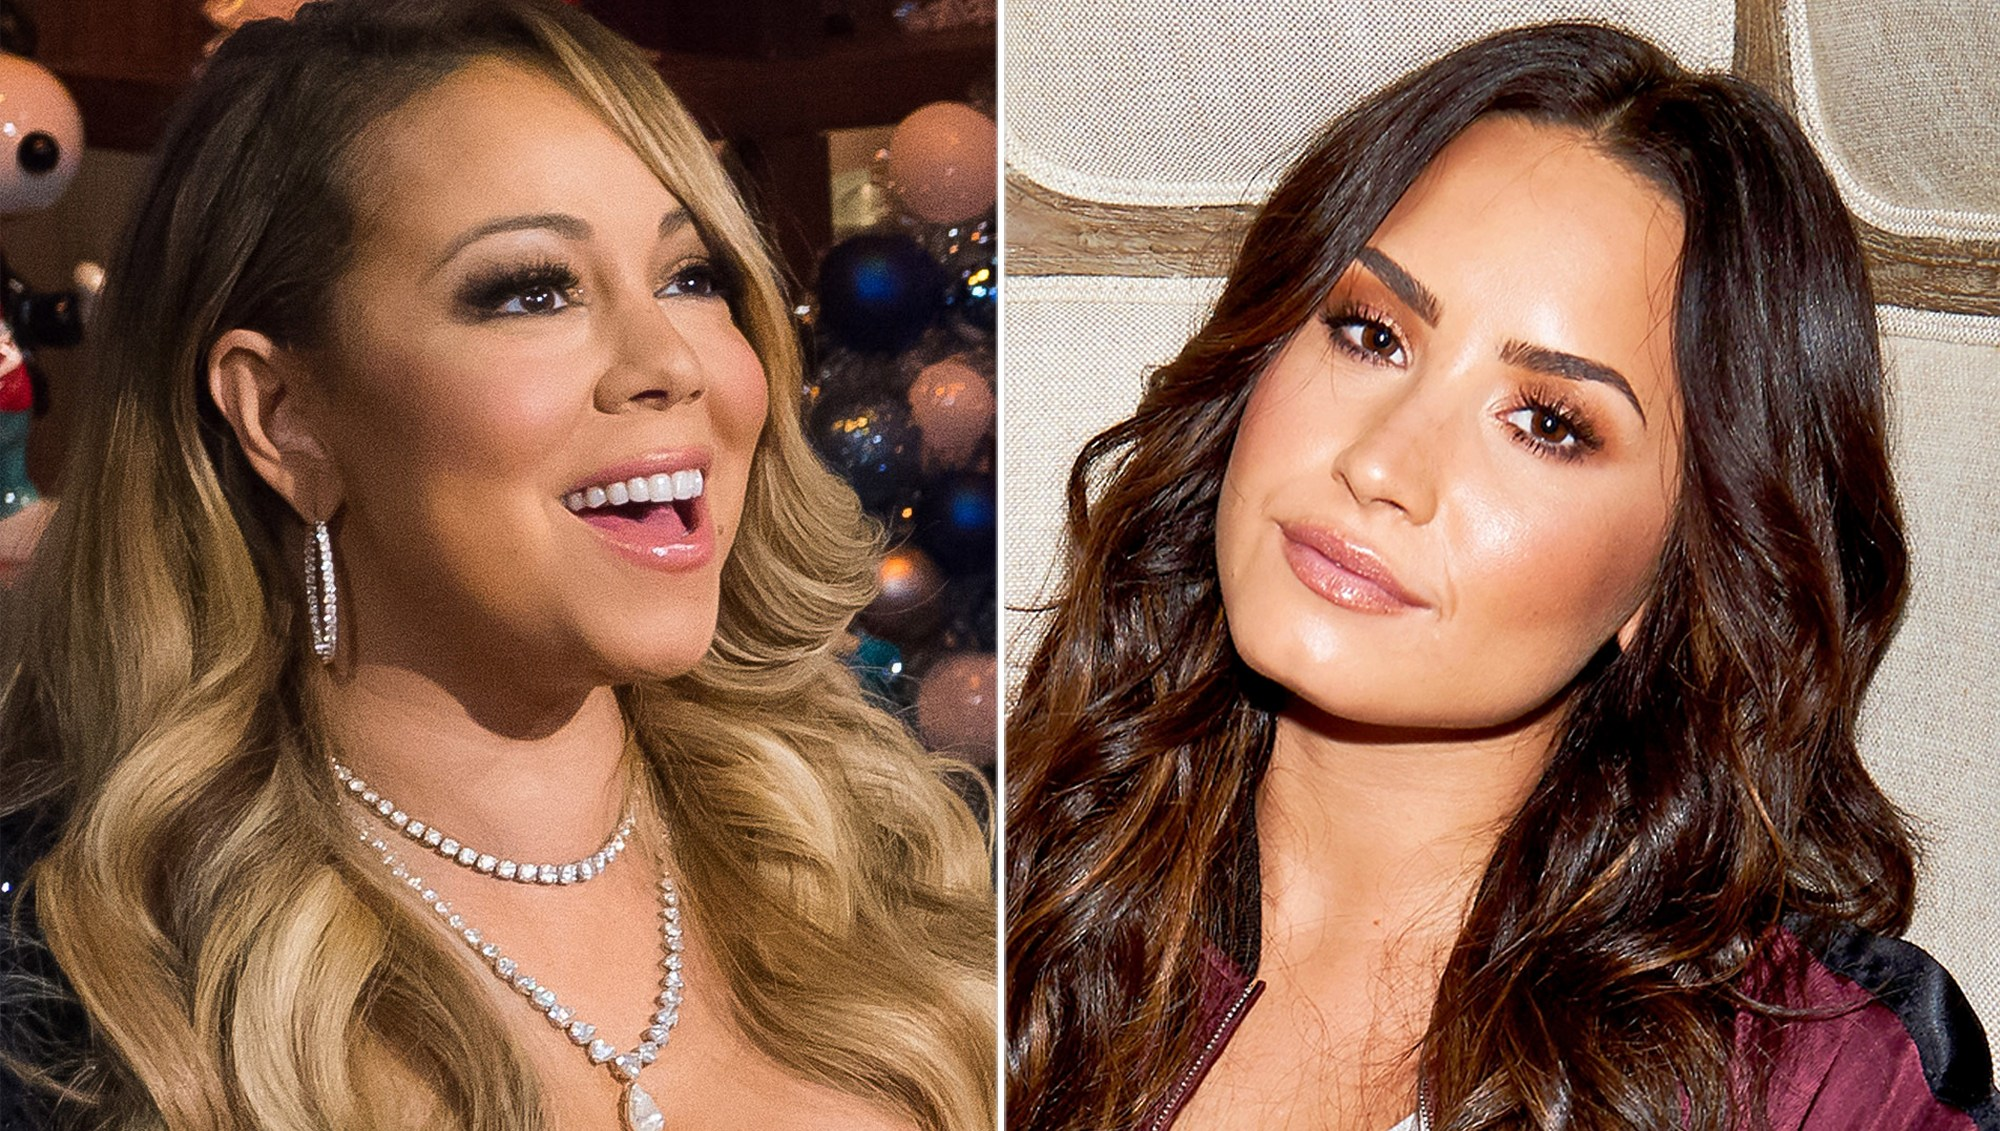 Stars Who've Battled Mental Health Issues